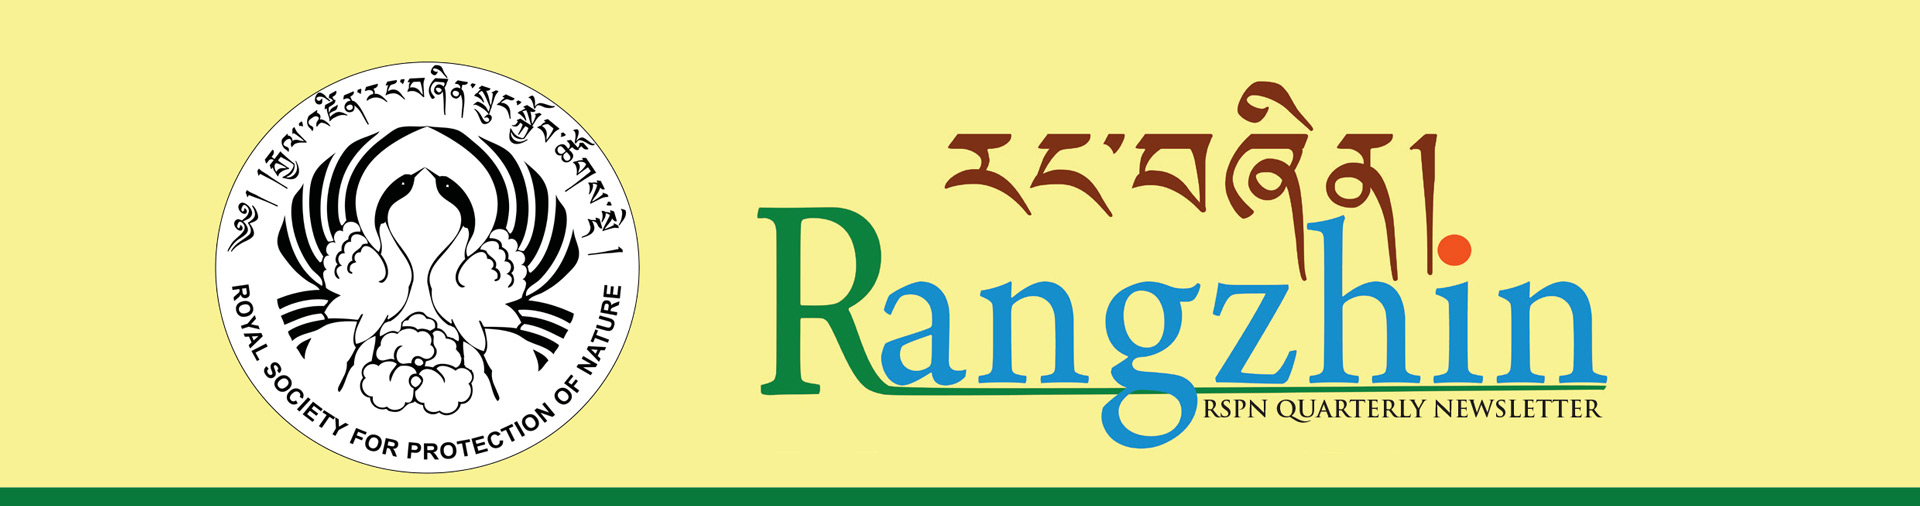 Rangzhin_header